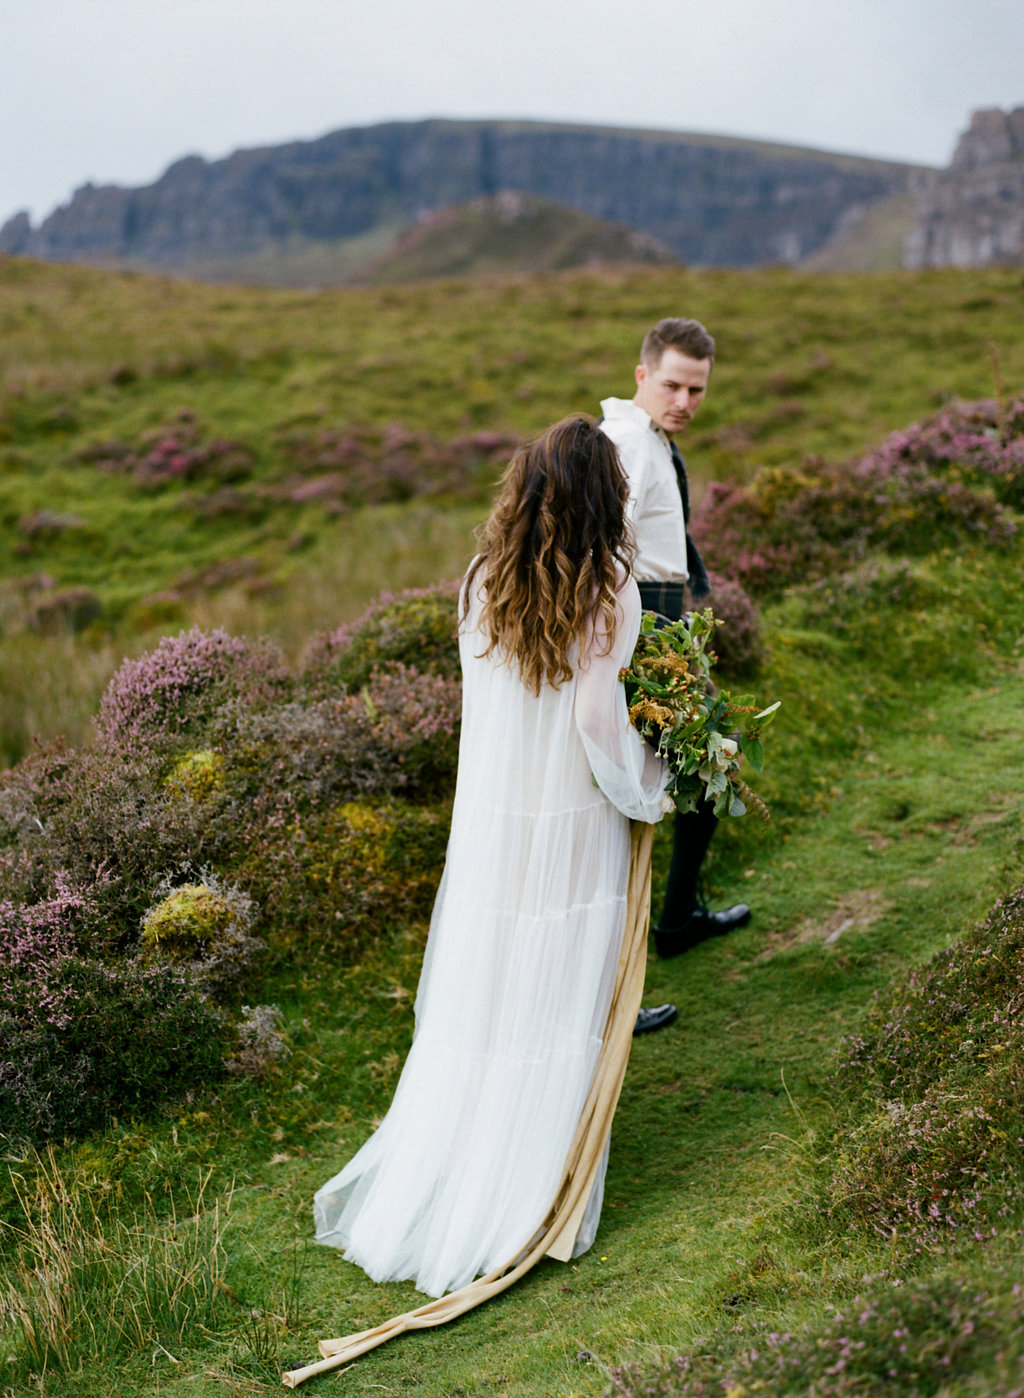 Scotland-Prewedding-highlands-castle-Engagment-Photos-Katie-Grant (15 of 139).jpg